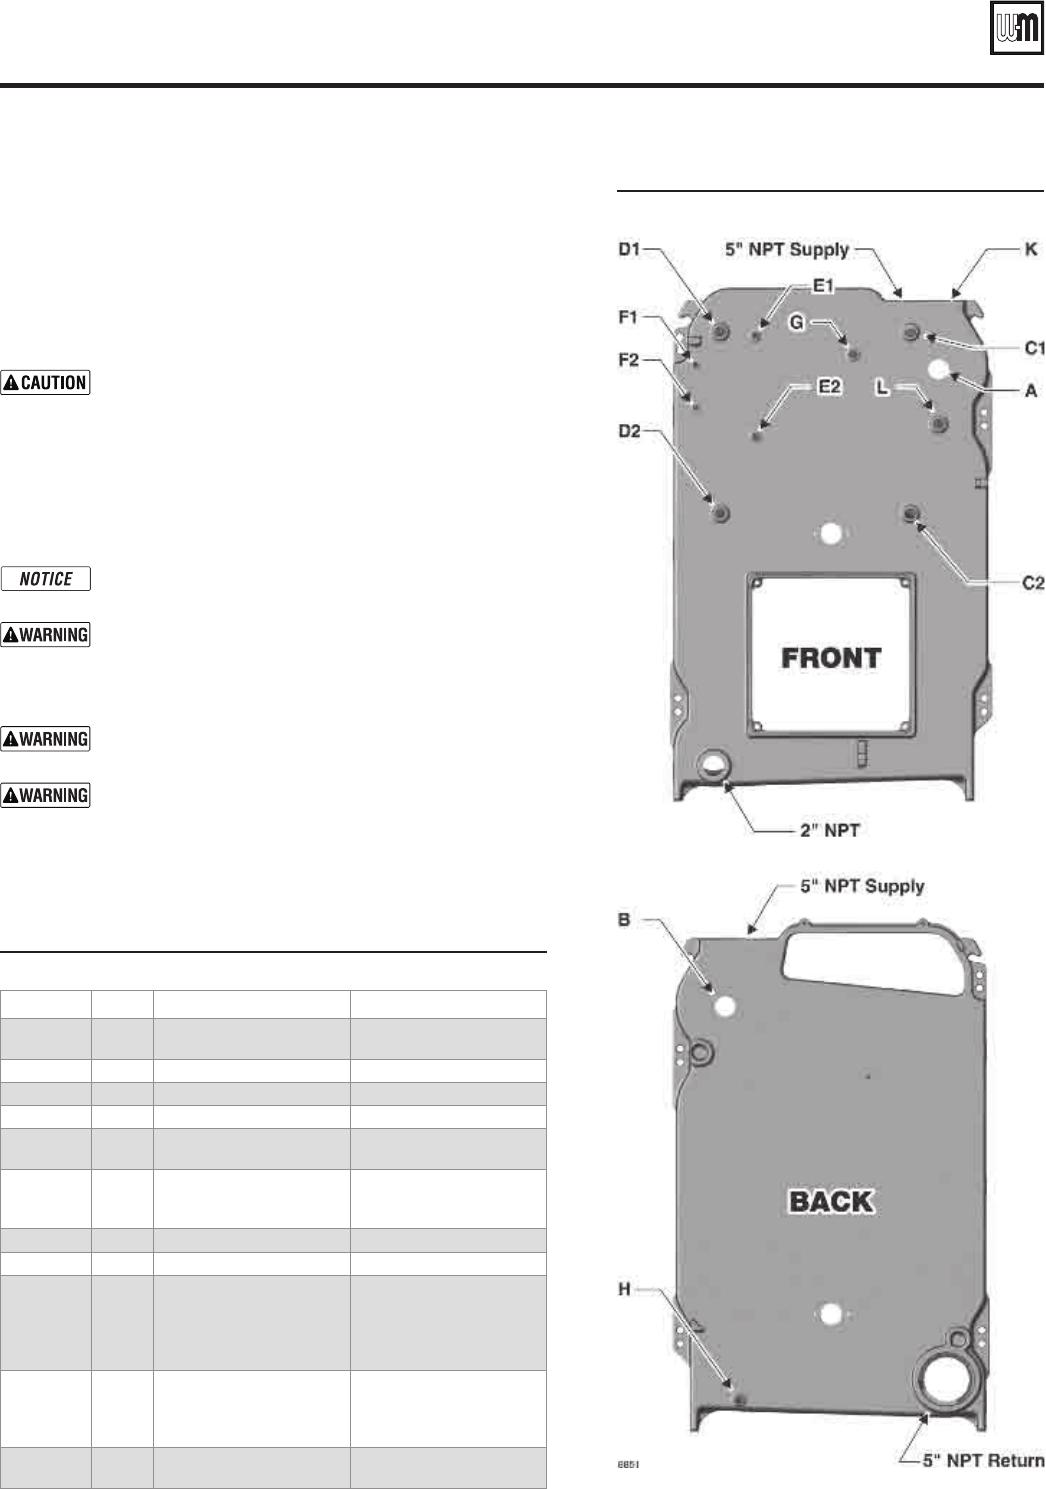 Weil-McLain 88 Perform hydrostatic pressure test